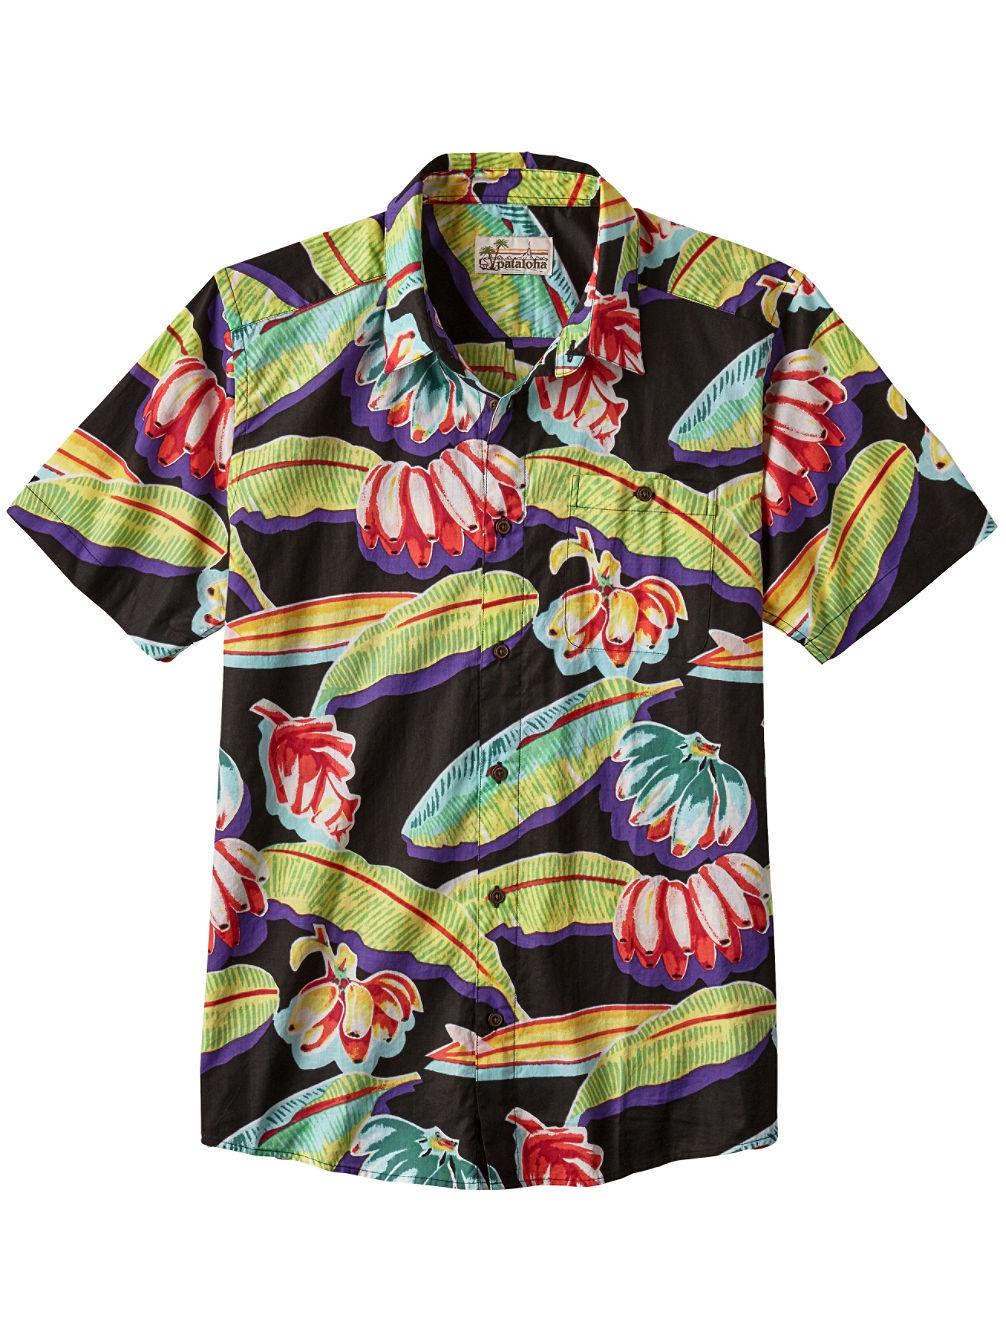 a936e847 Buy Patagonia Malihini Pataloha Shirt online at Blue Tomato